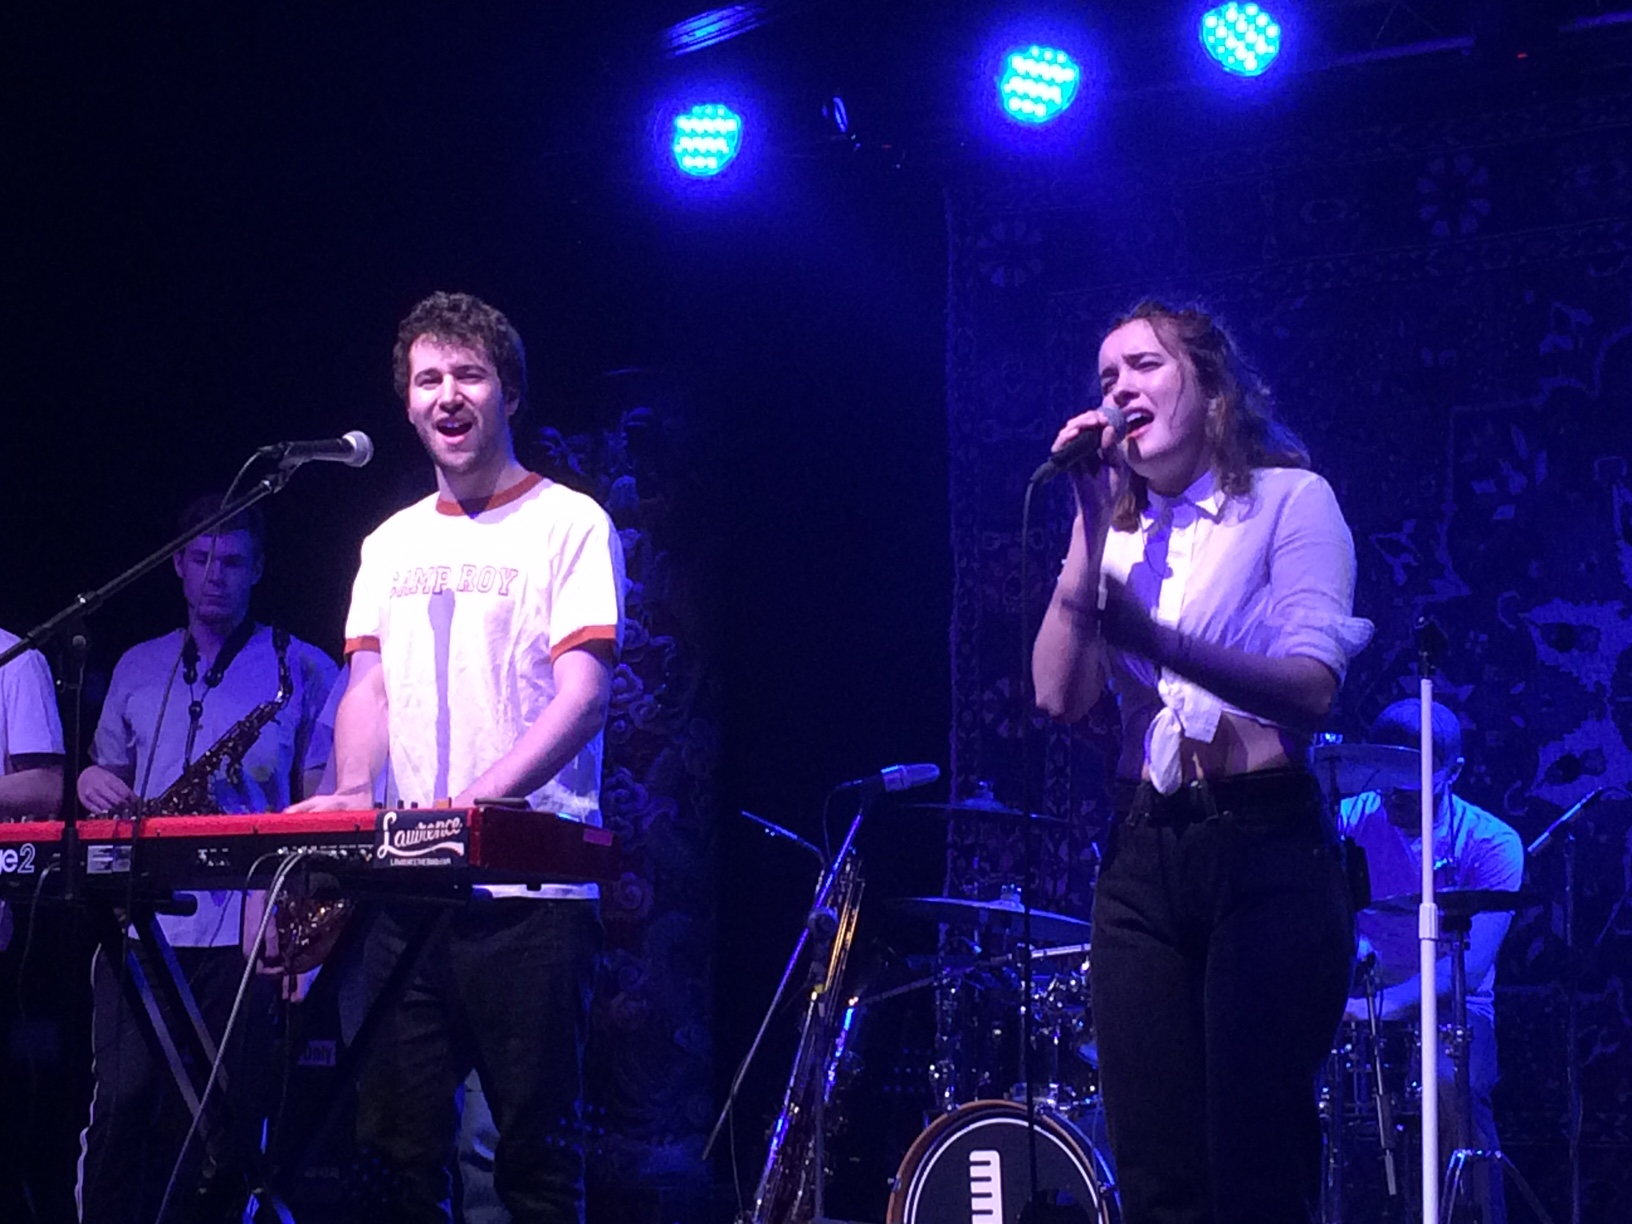 Lawrence The Band Makes San Antonio Debut Brings